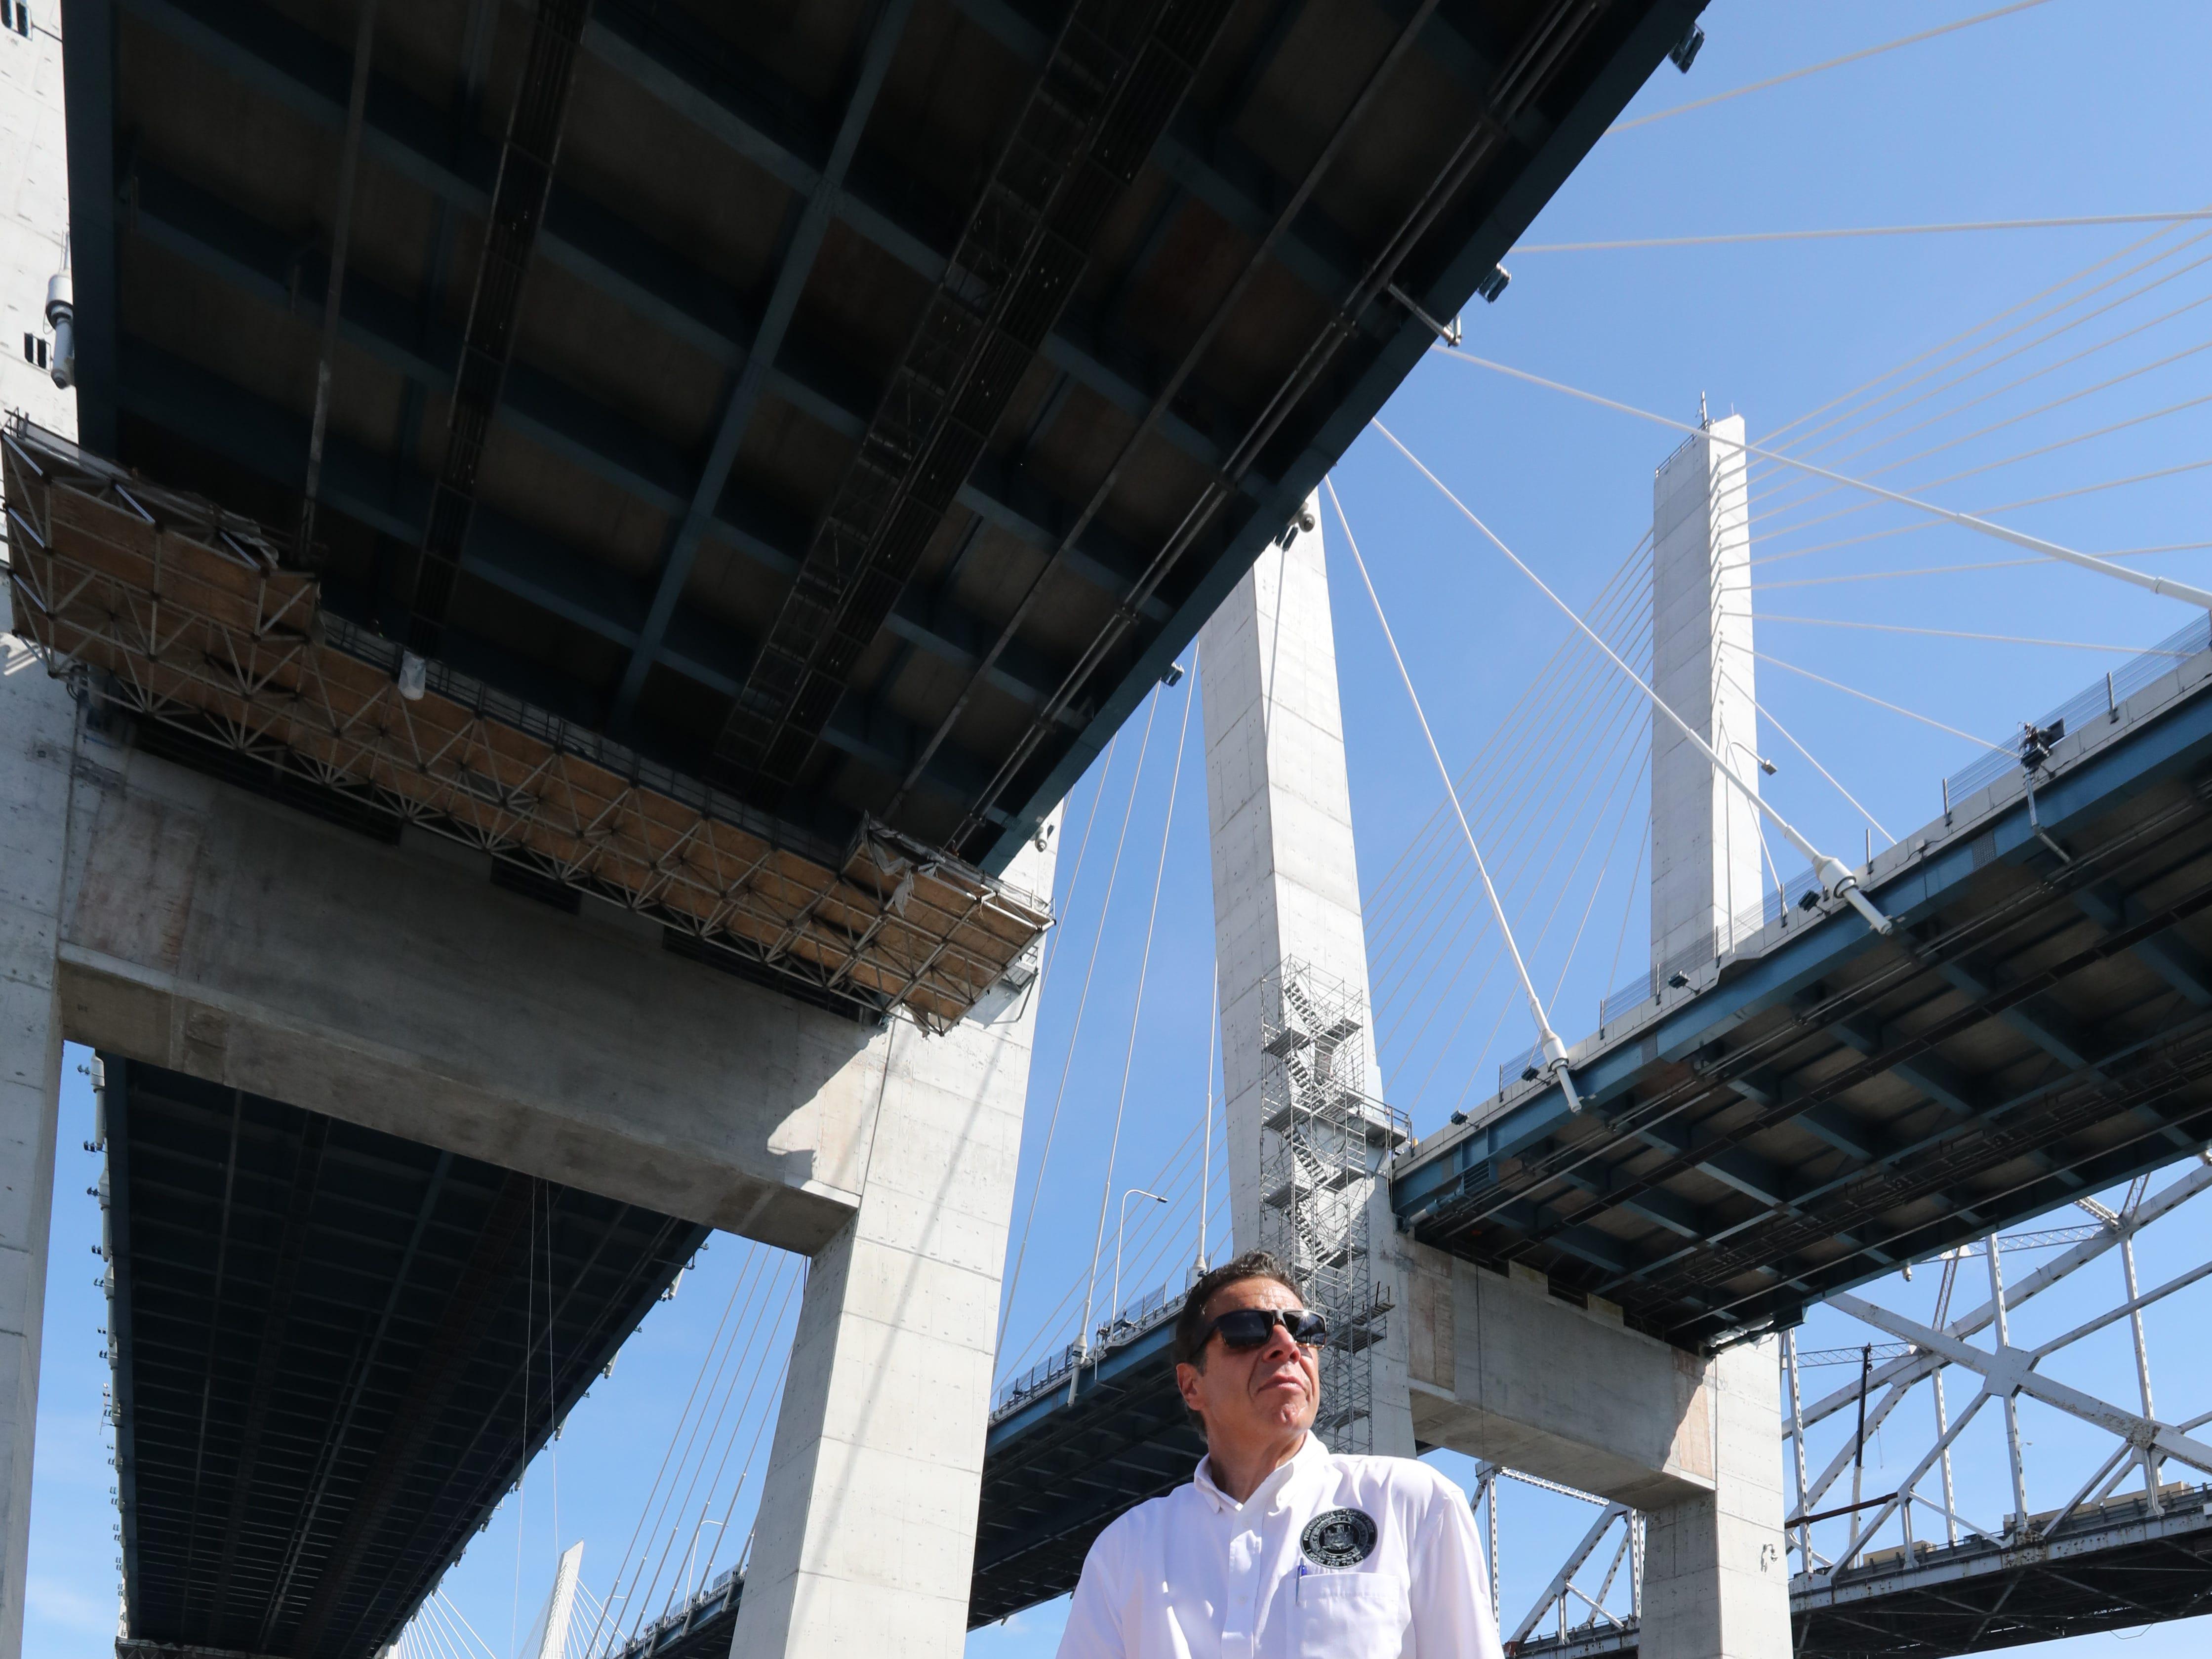 Gov. Andrew Cuomo on a boat under the Gov. Mario Cuomo Bridge Sept. 4, 2018.